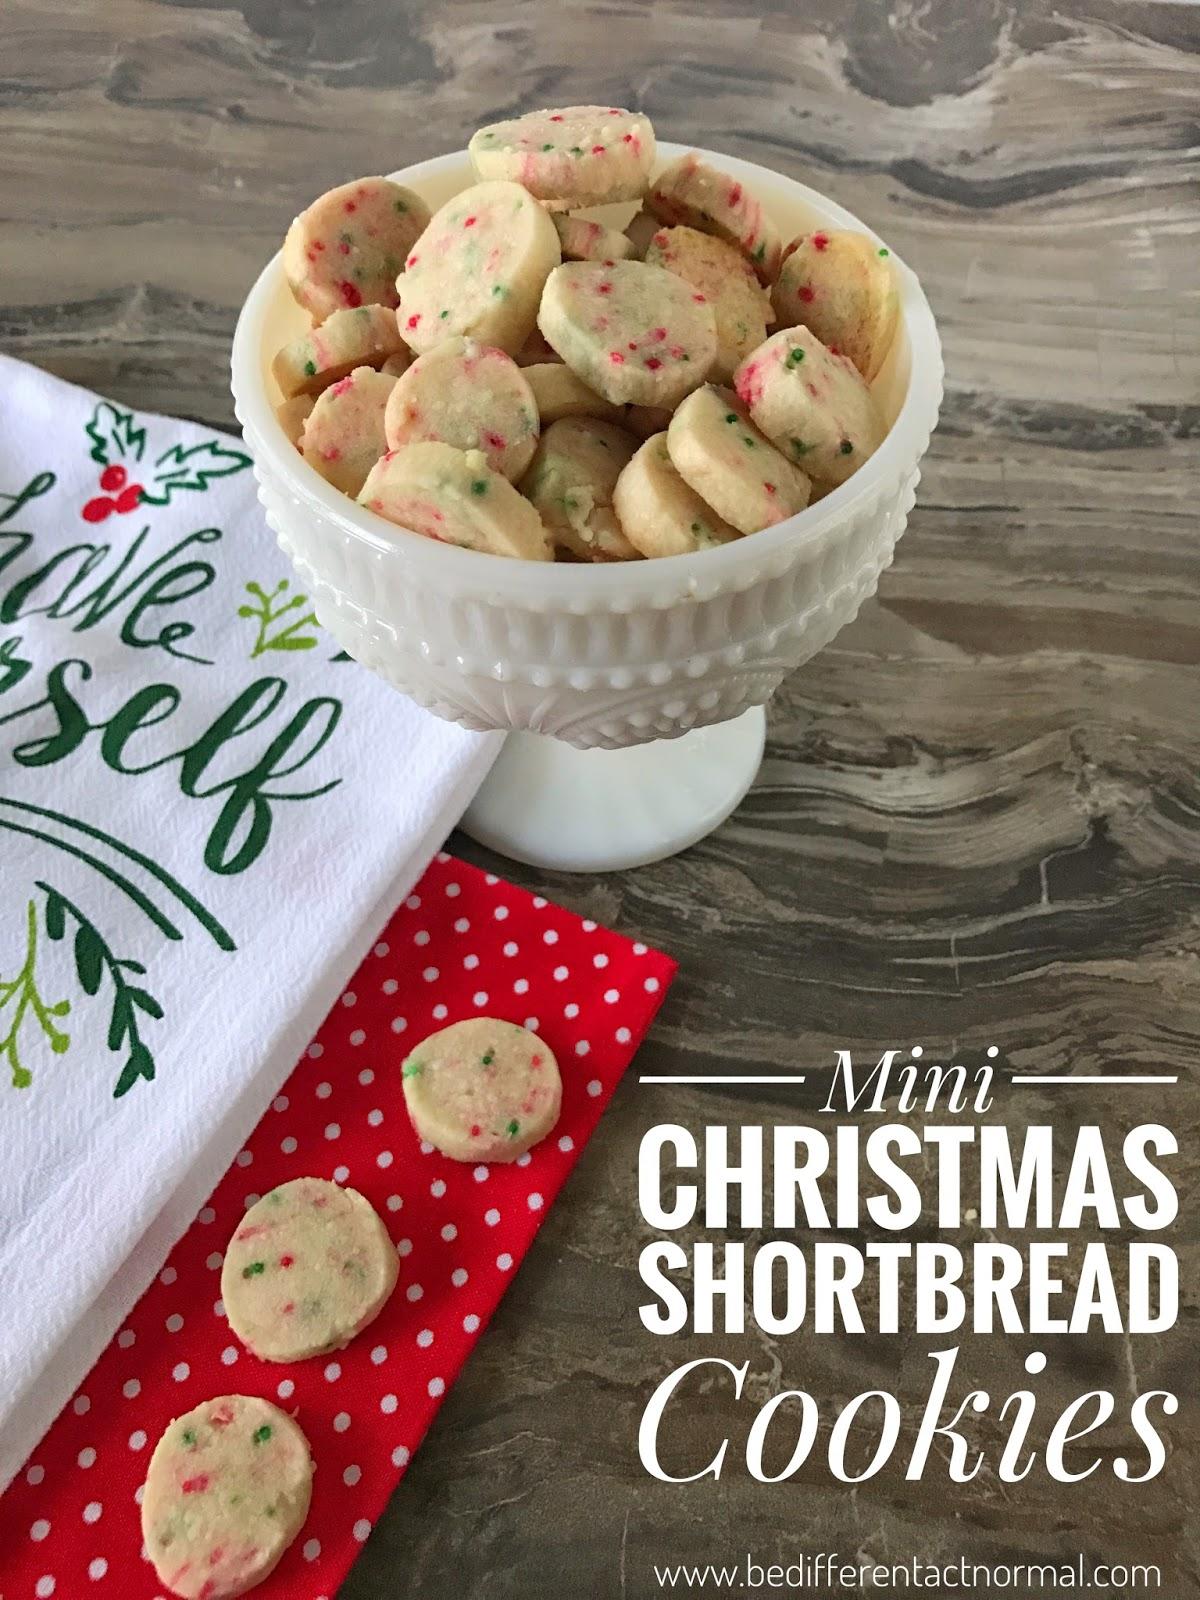 Christmas Shortbread Cookies.Mini Christmas Shortbread Cookies For Santa S Elves